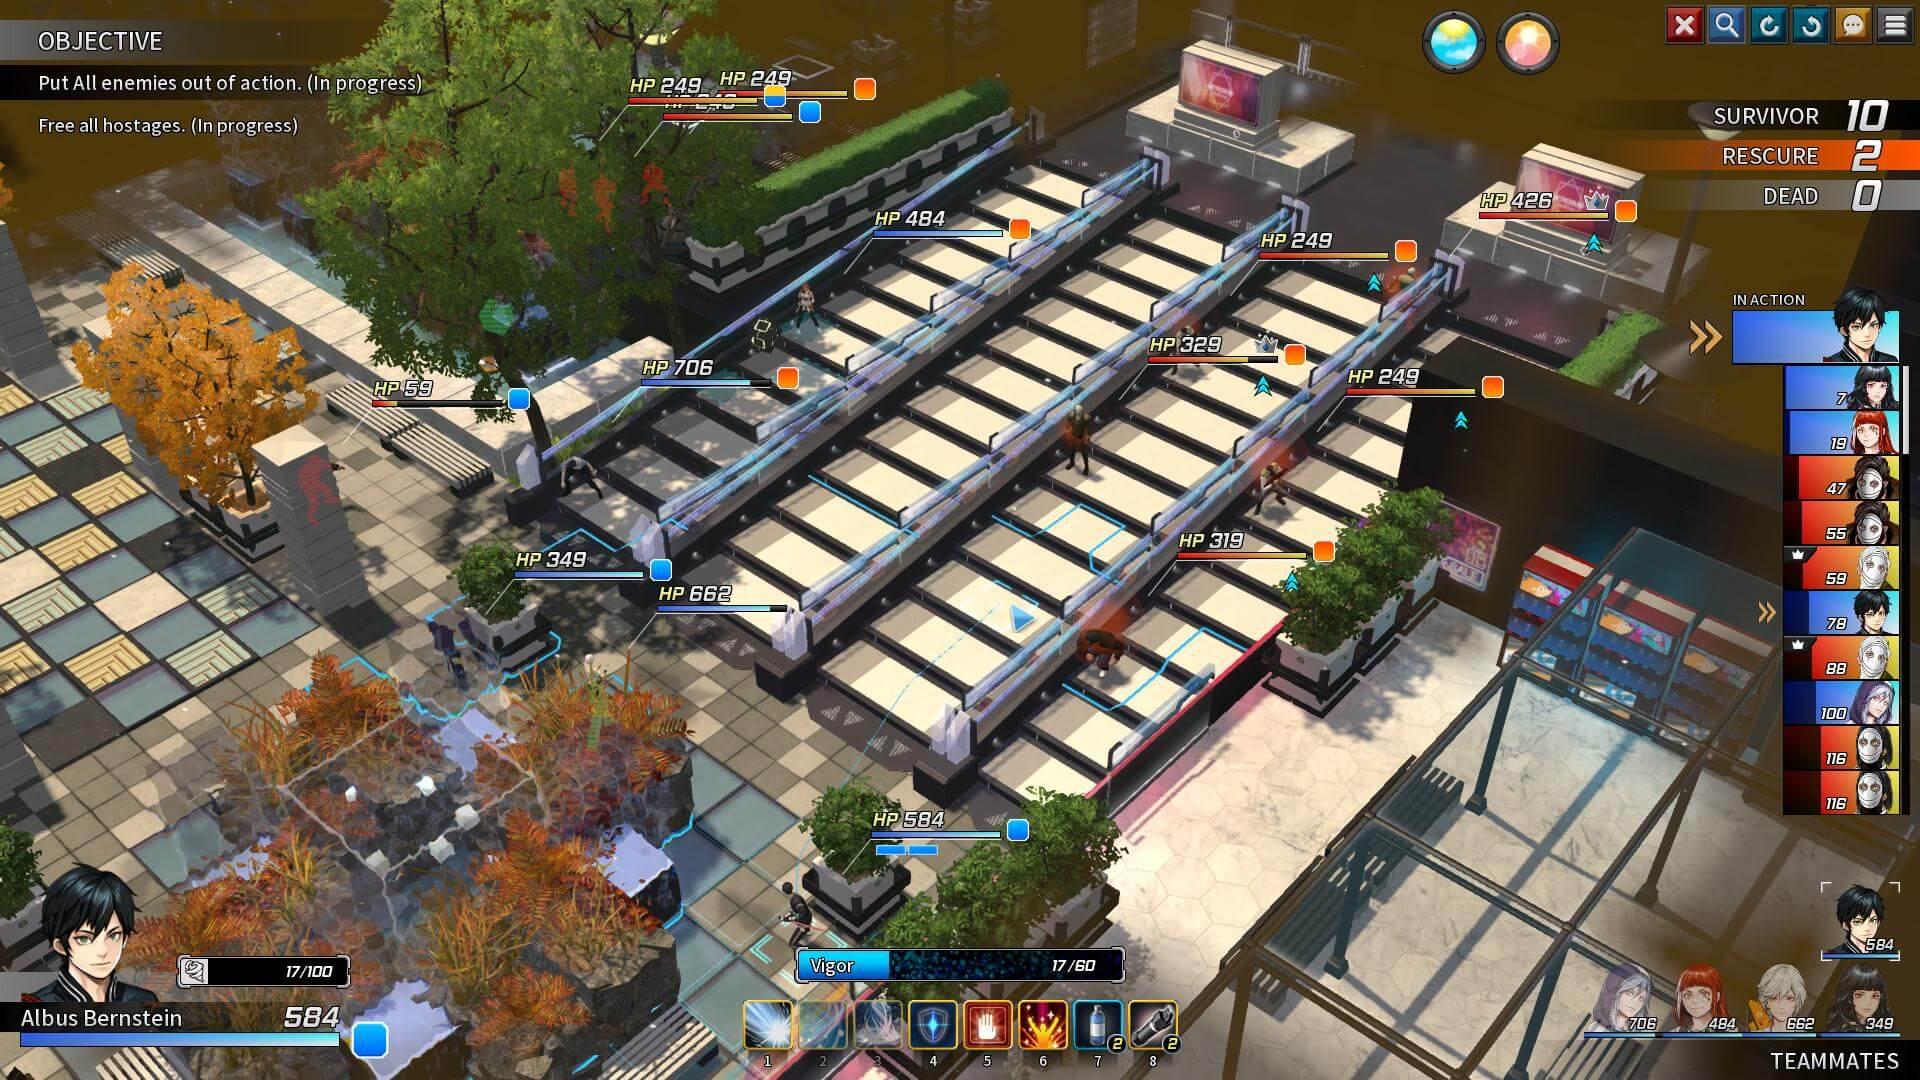 Скриншот из игры TROUBLESHOOTER: Abandoned Children